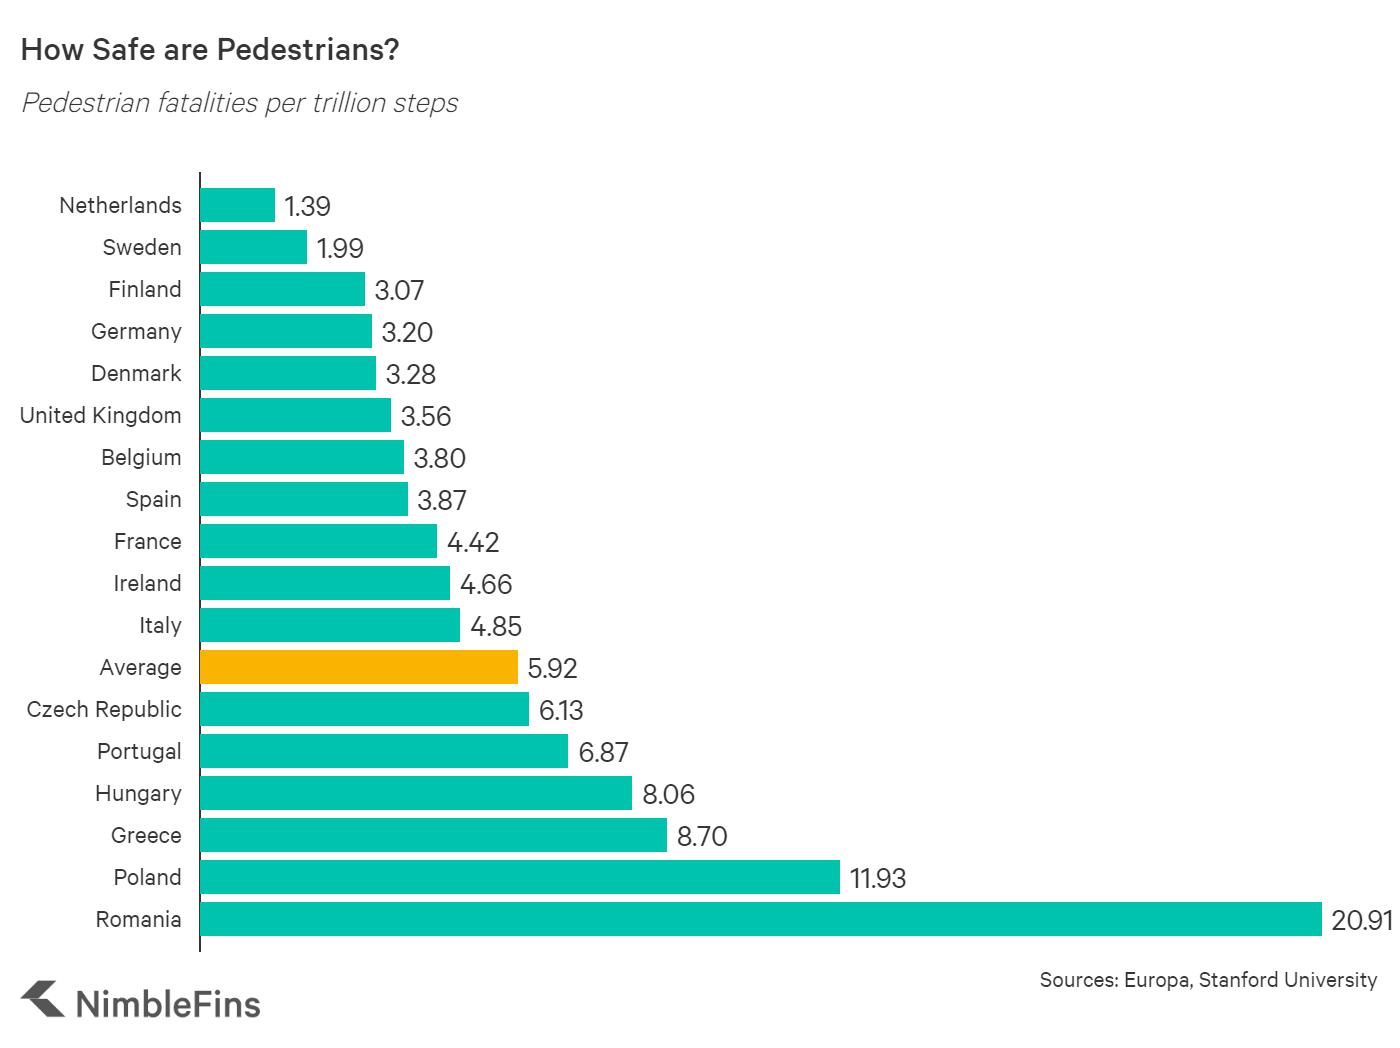 chart showing the number of pedestrian fatalities per one billion pedestrian steps